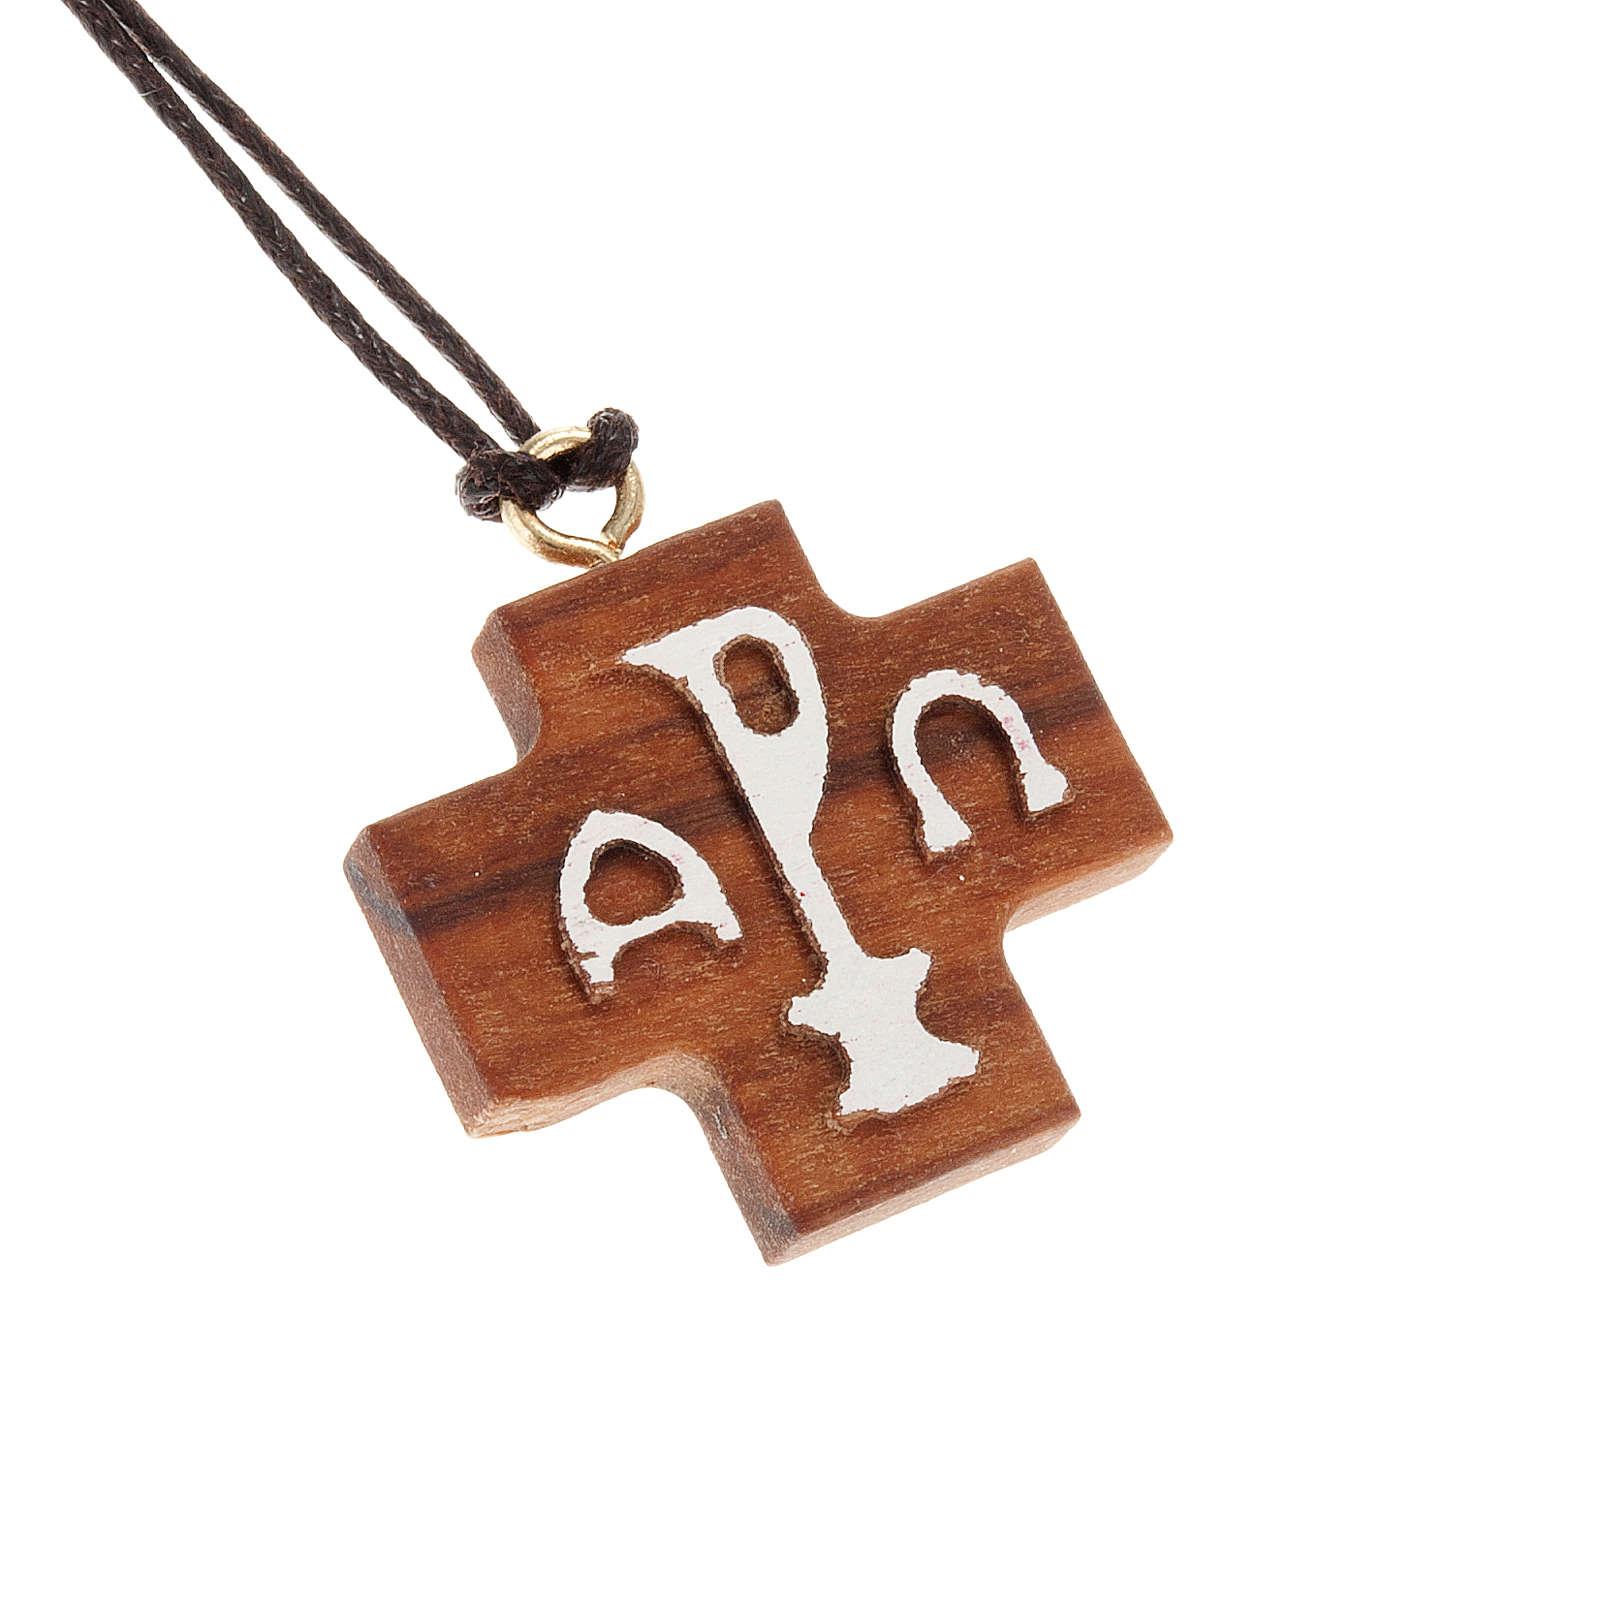 Kreuz Anhänger Alpha und Omega Relief aus Olivenholz 4